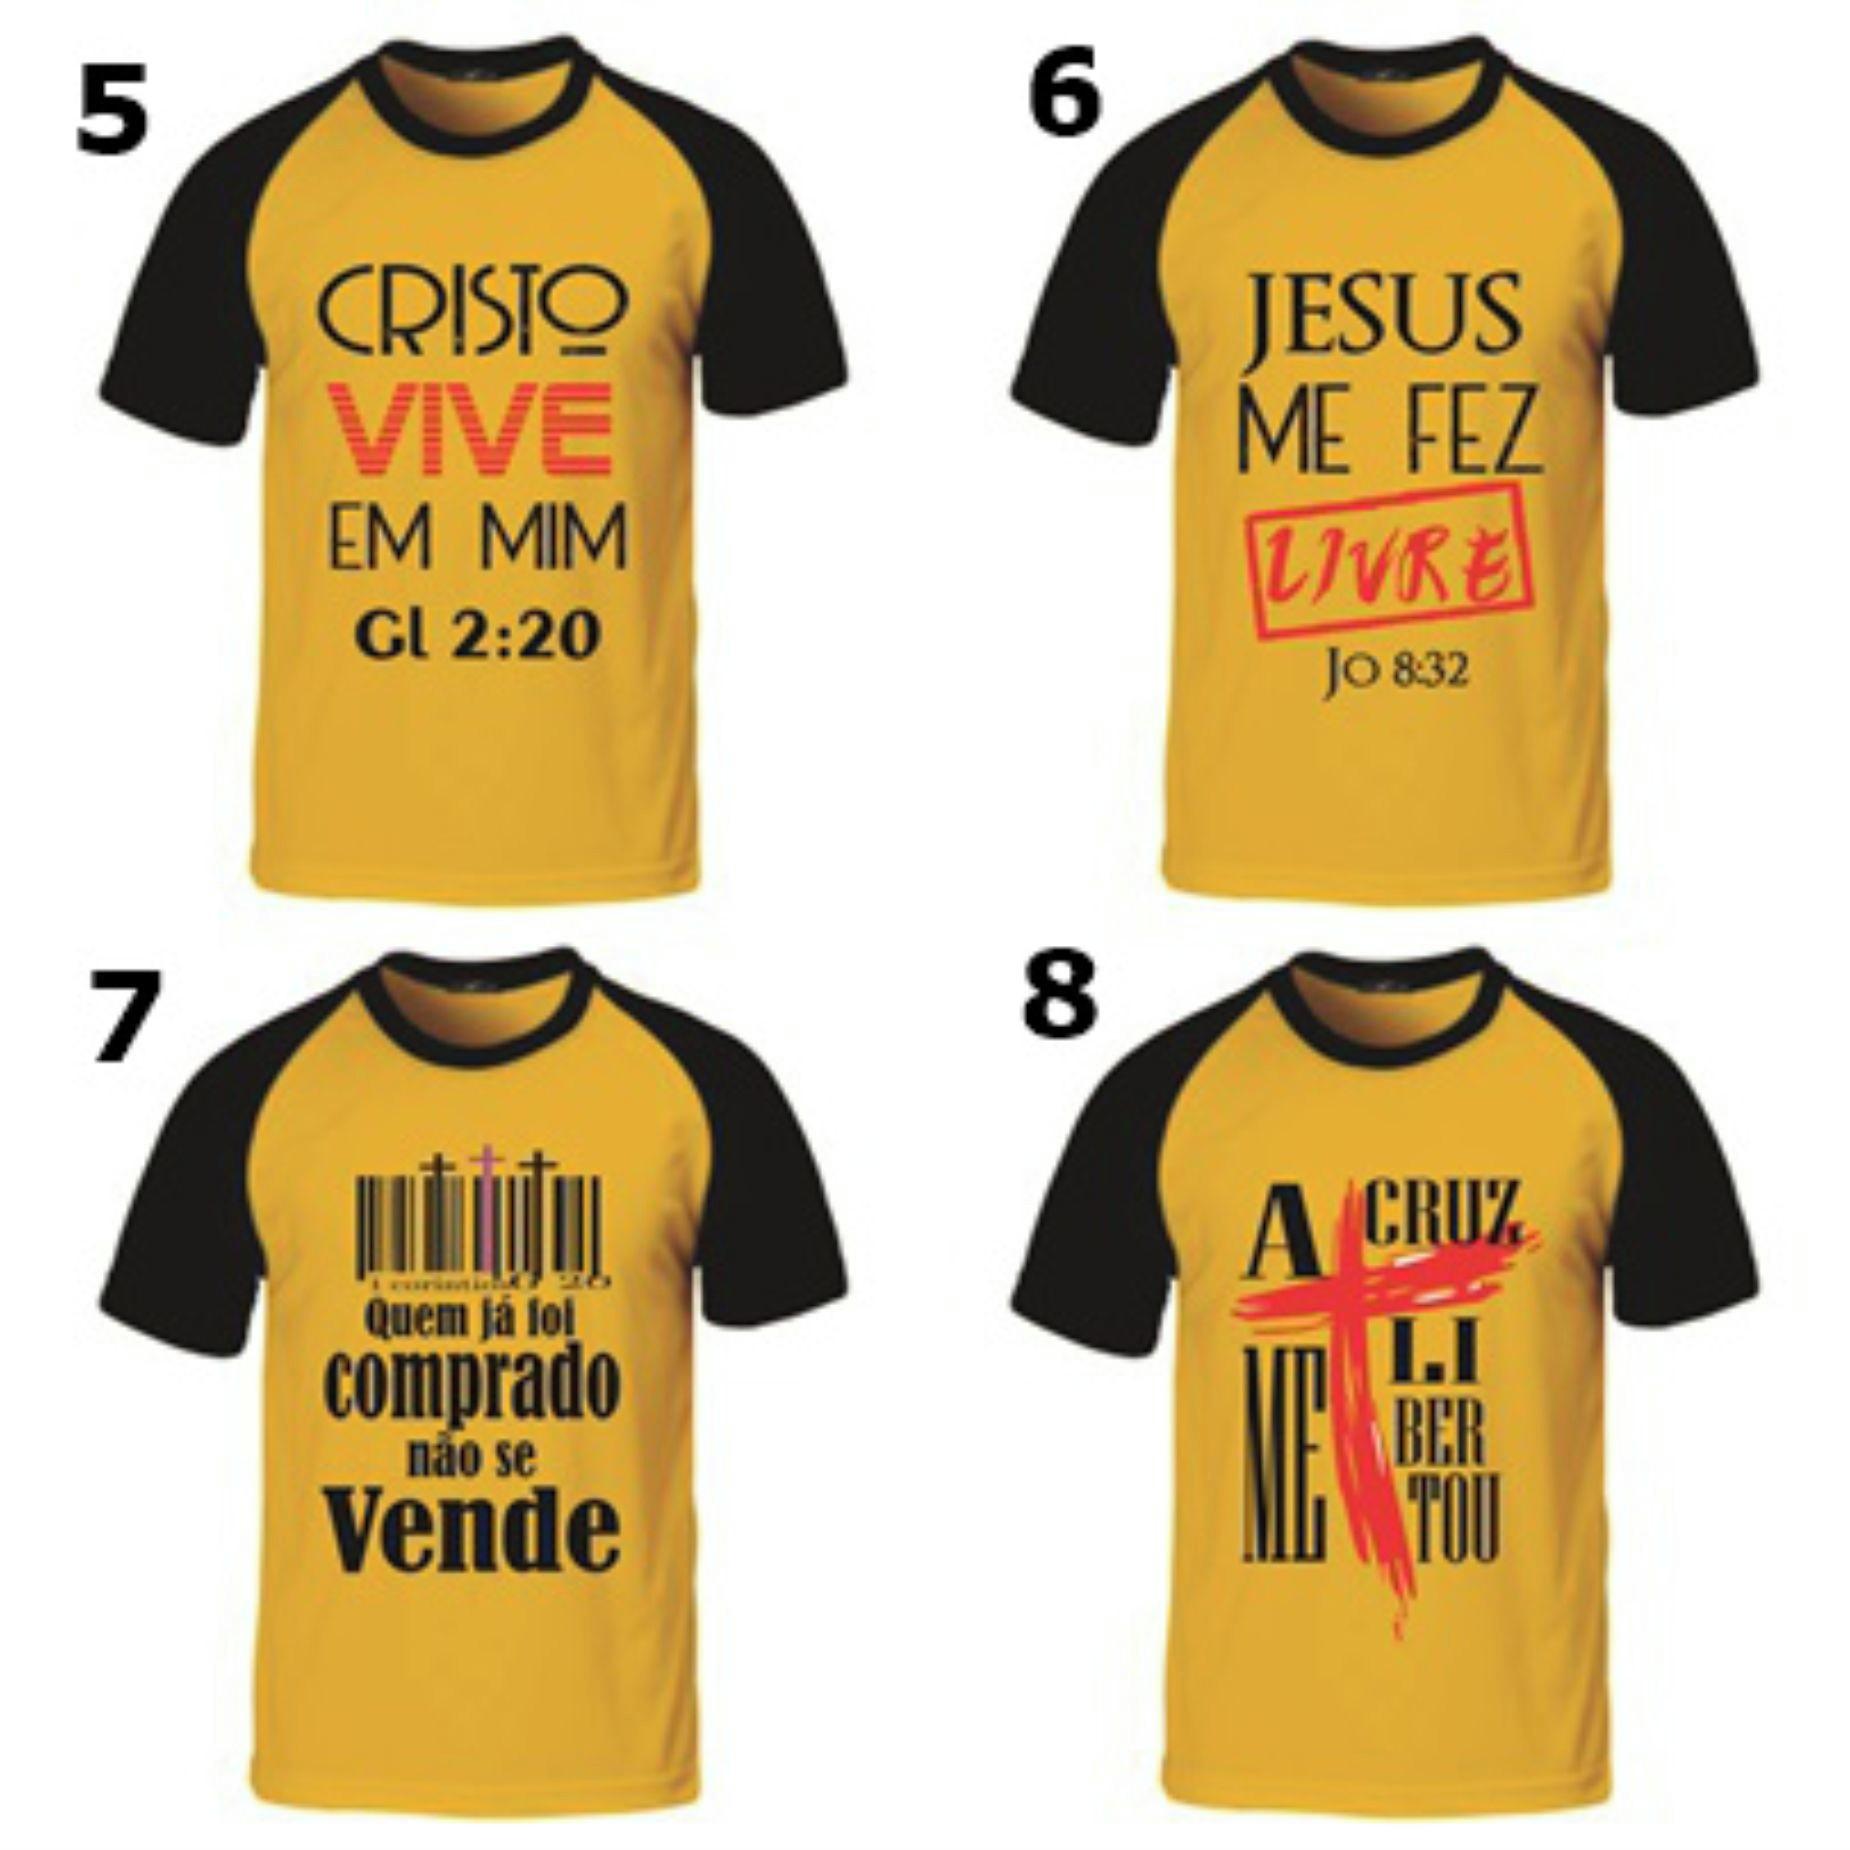 550c9850f Camisas Biblicas